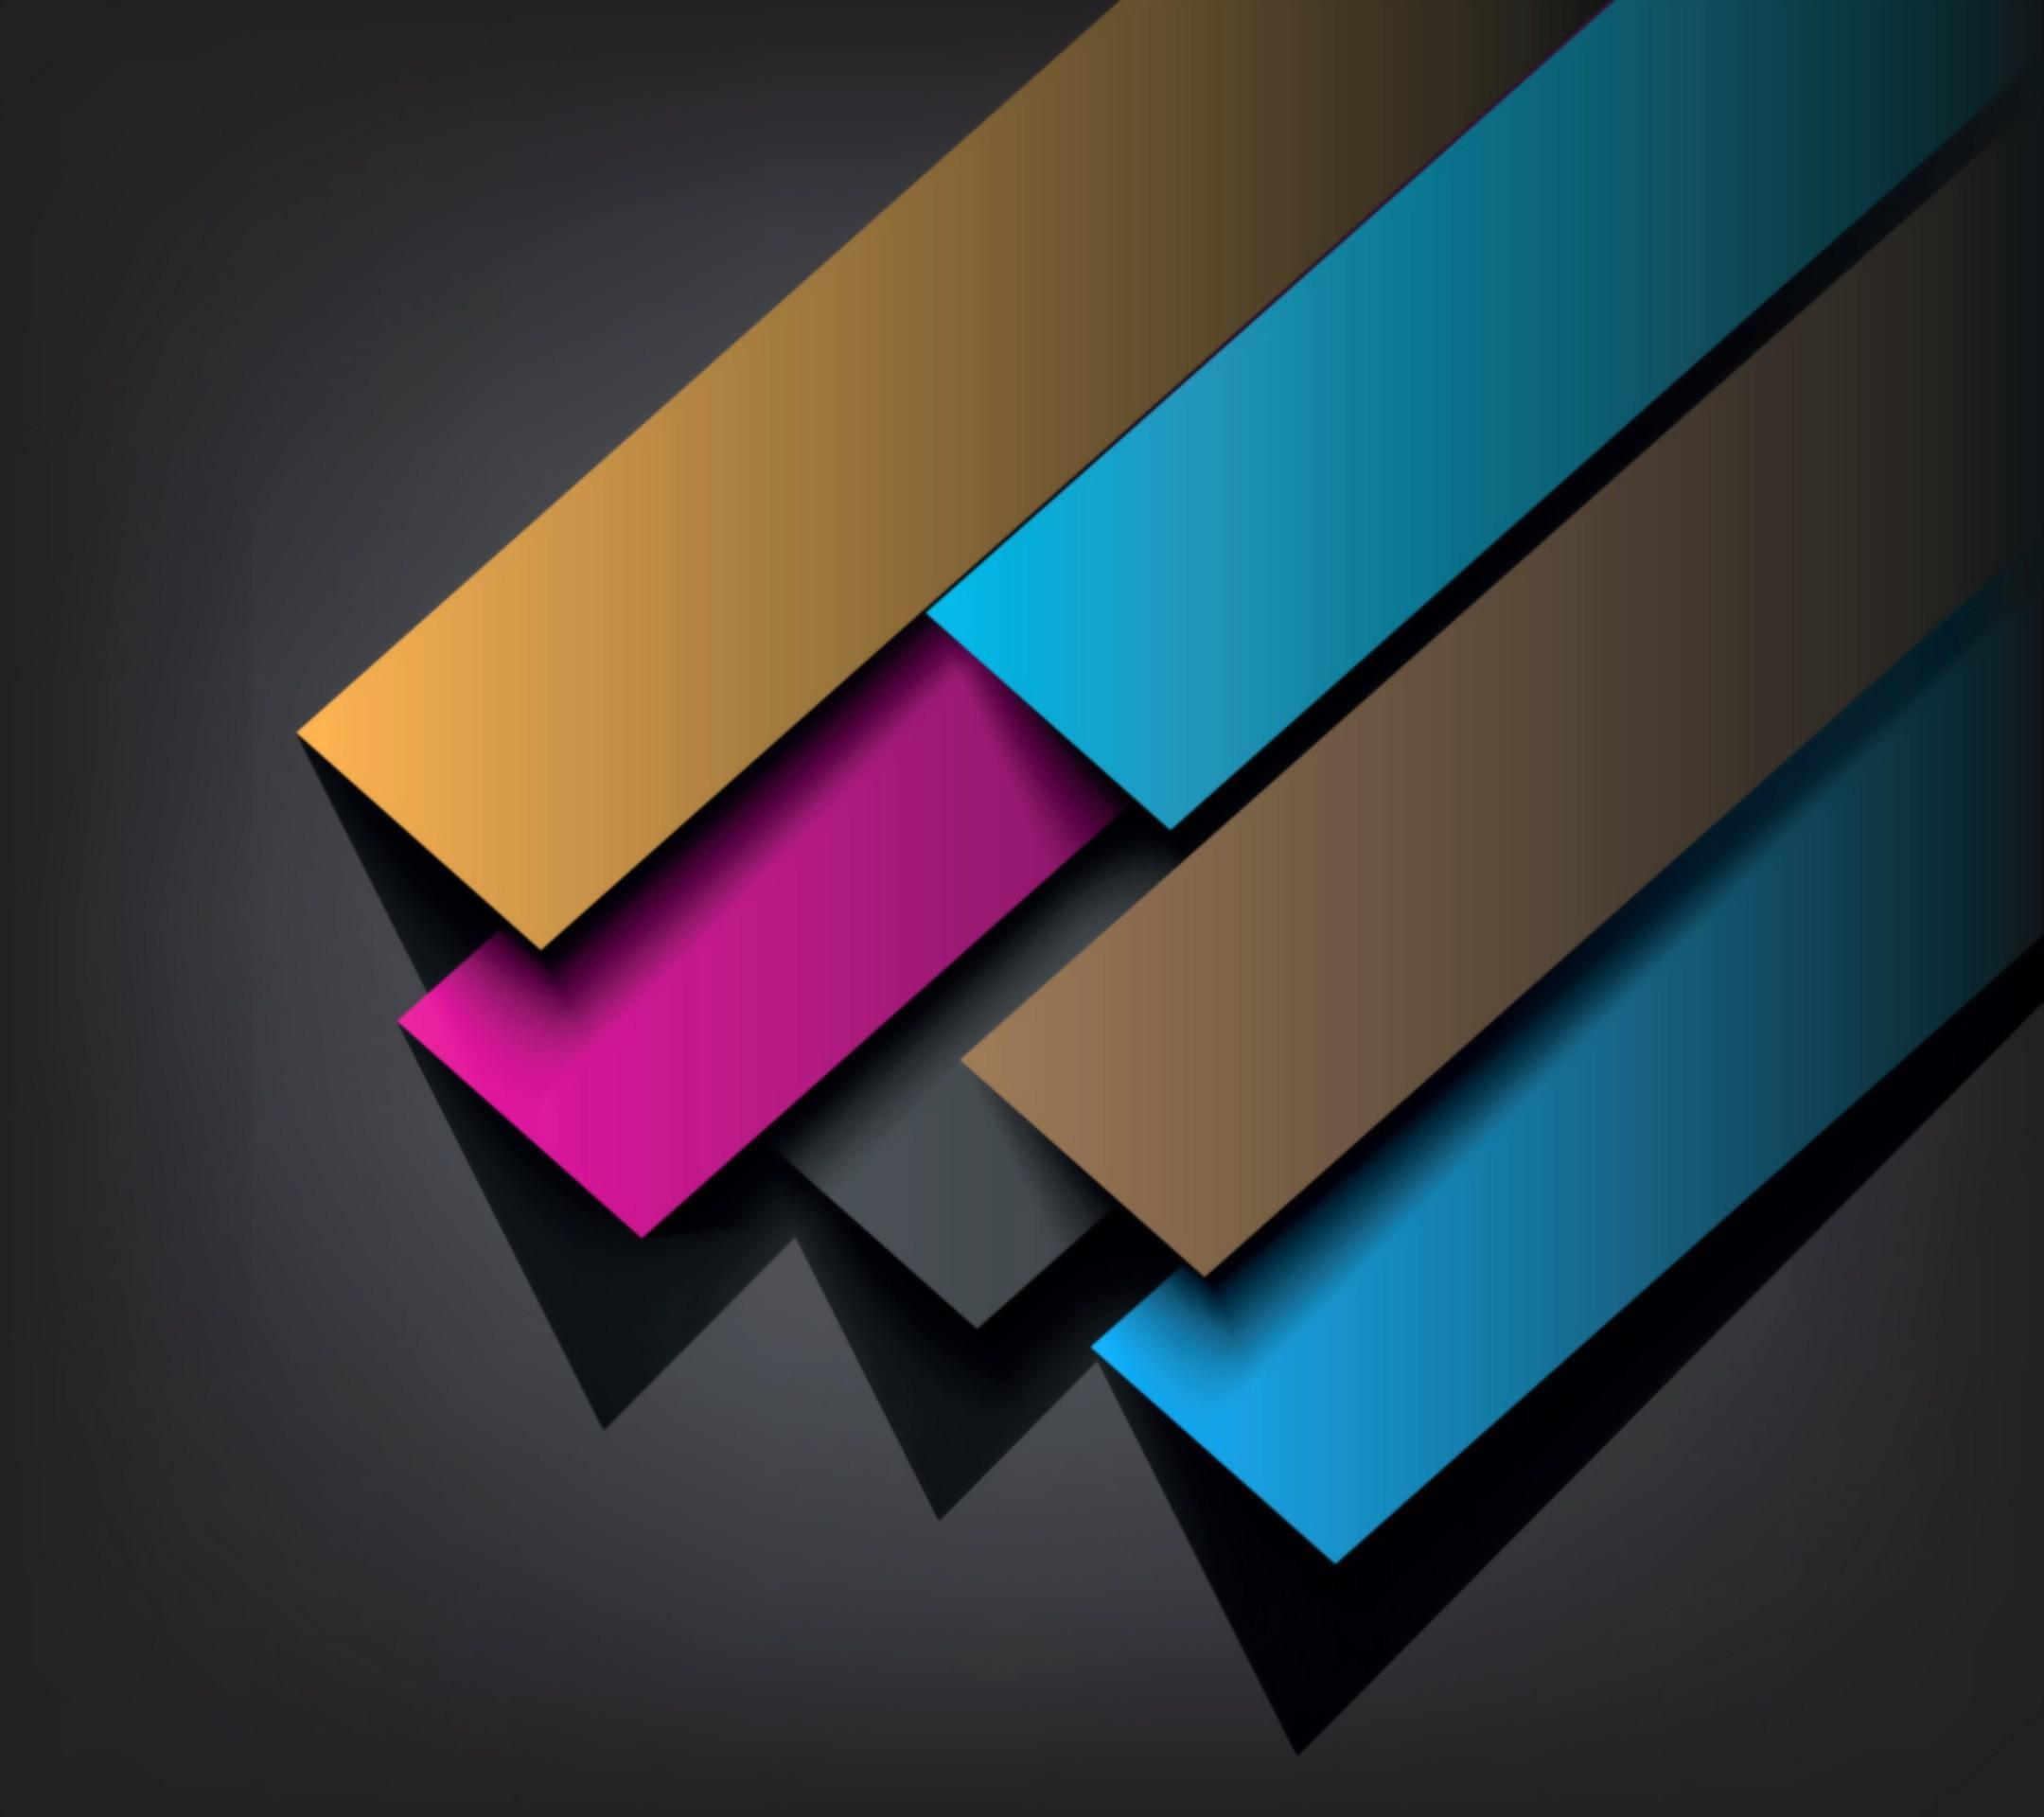 Shapes HD Wallpaper – Top 10 Abstract Google Nexus 10 HD Wallpapers .